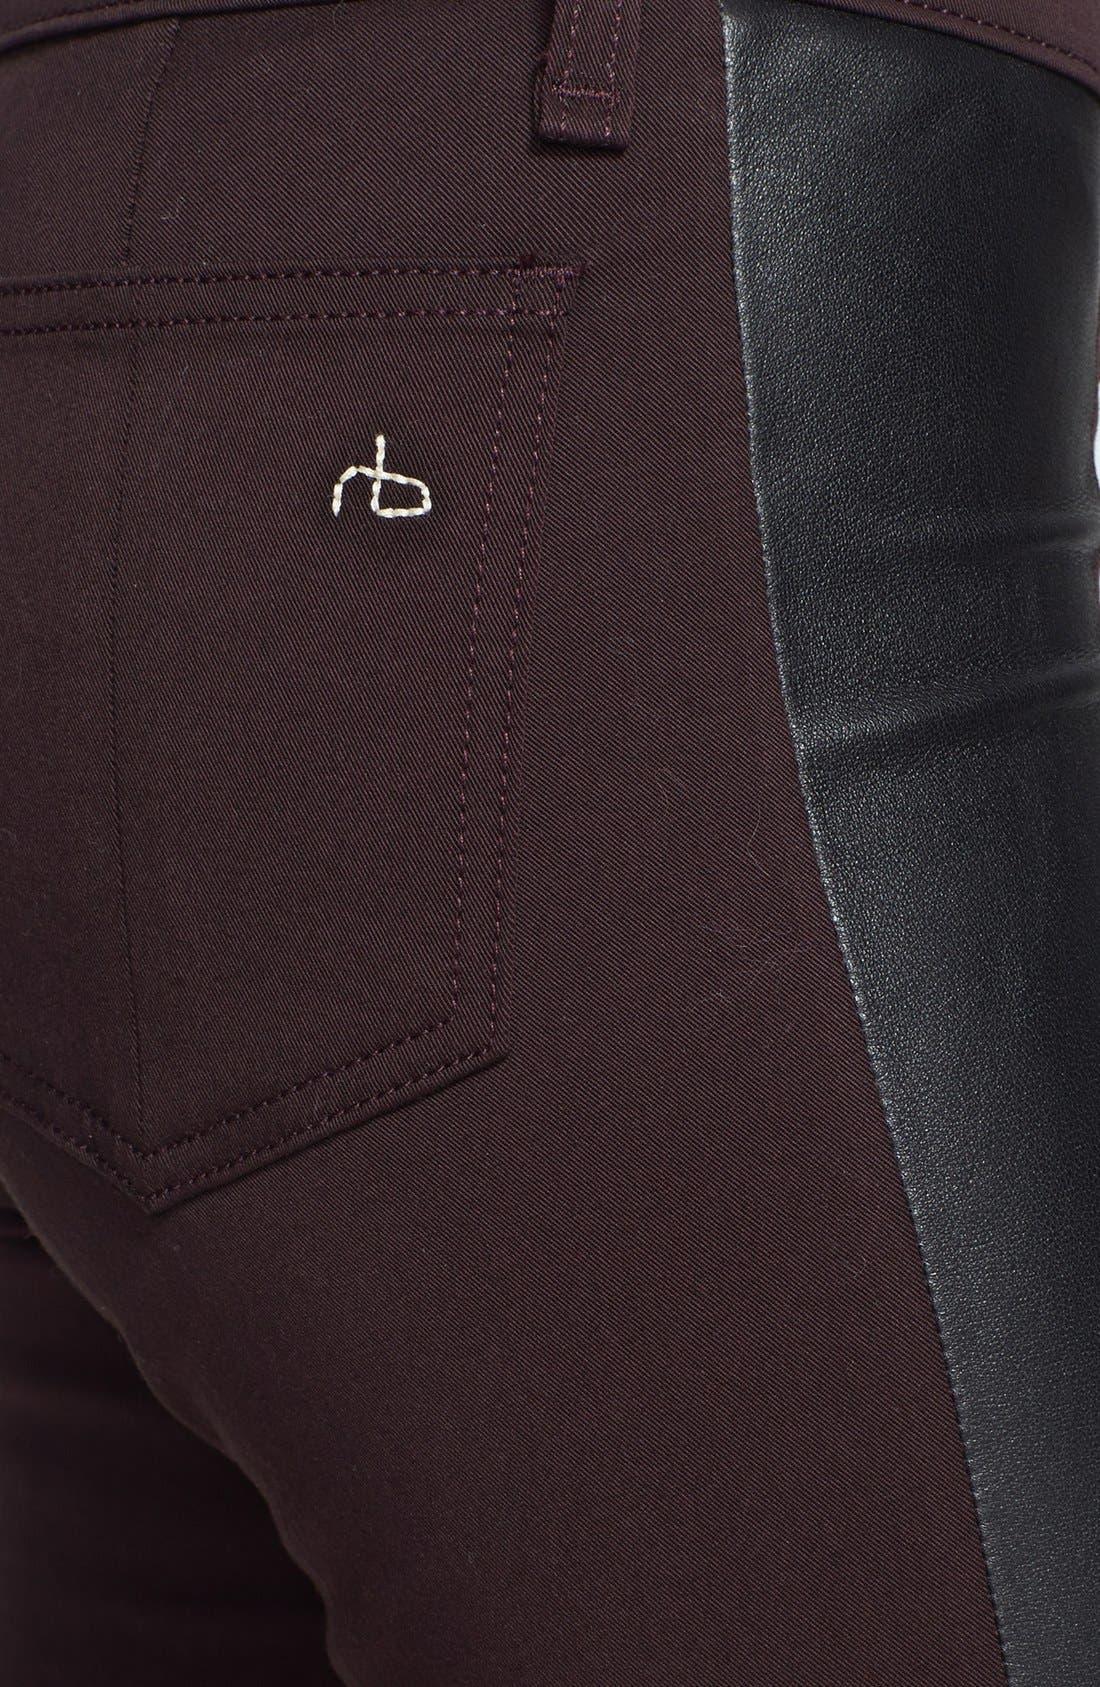 Alternate Image 3  - rag & bone/JEAN 'Pop' Leather Inset Skinny Jeans (Wine)